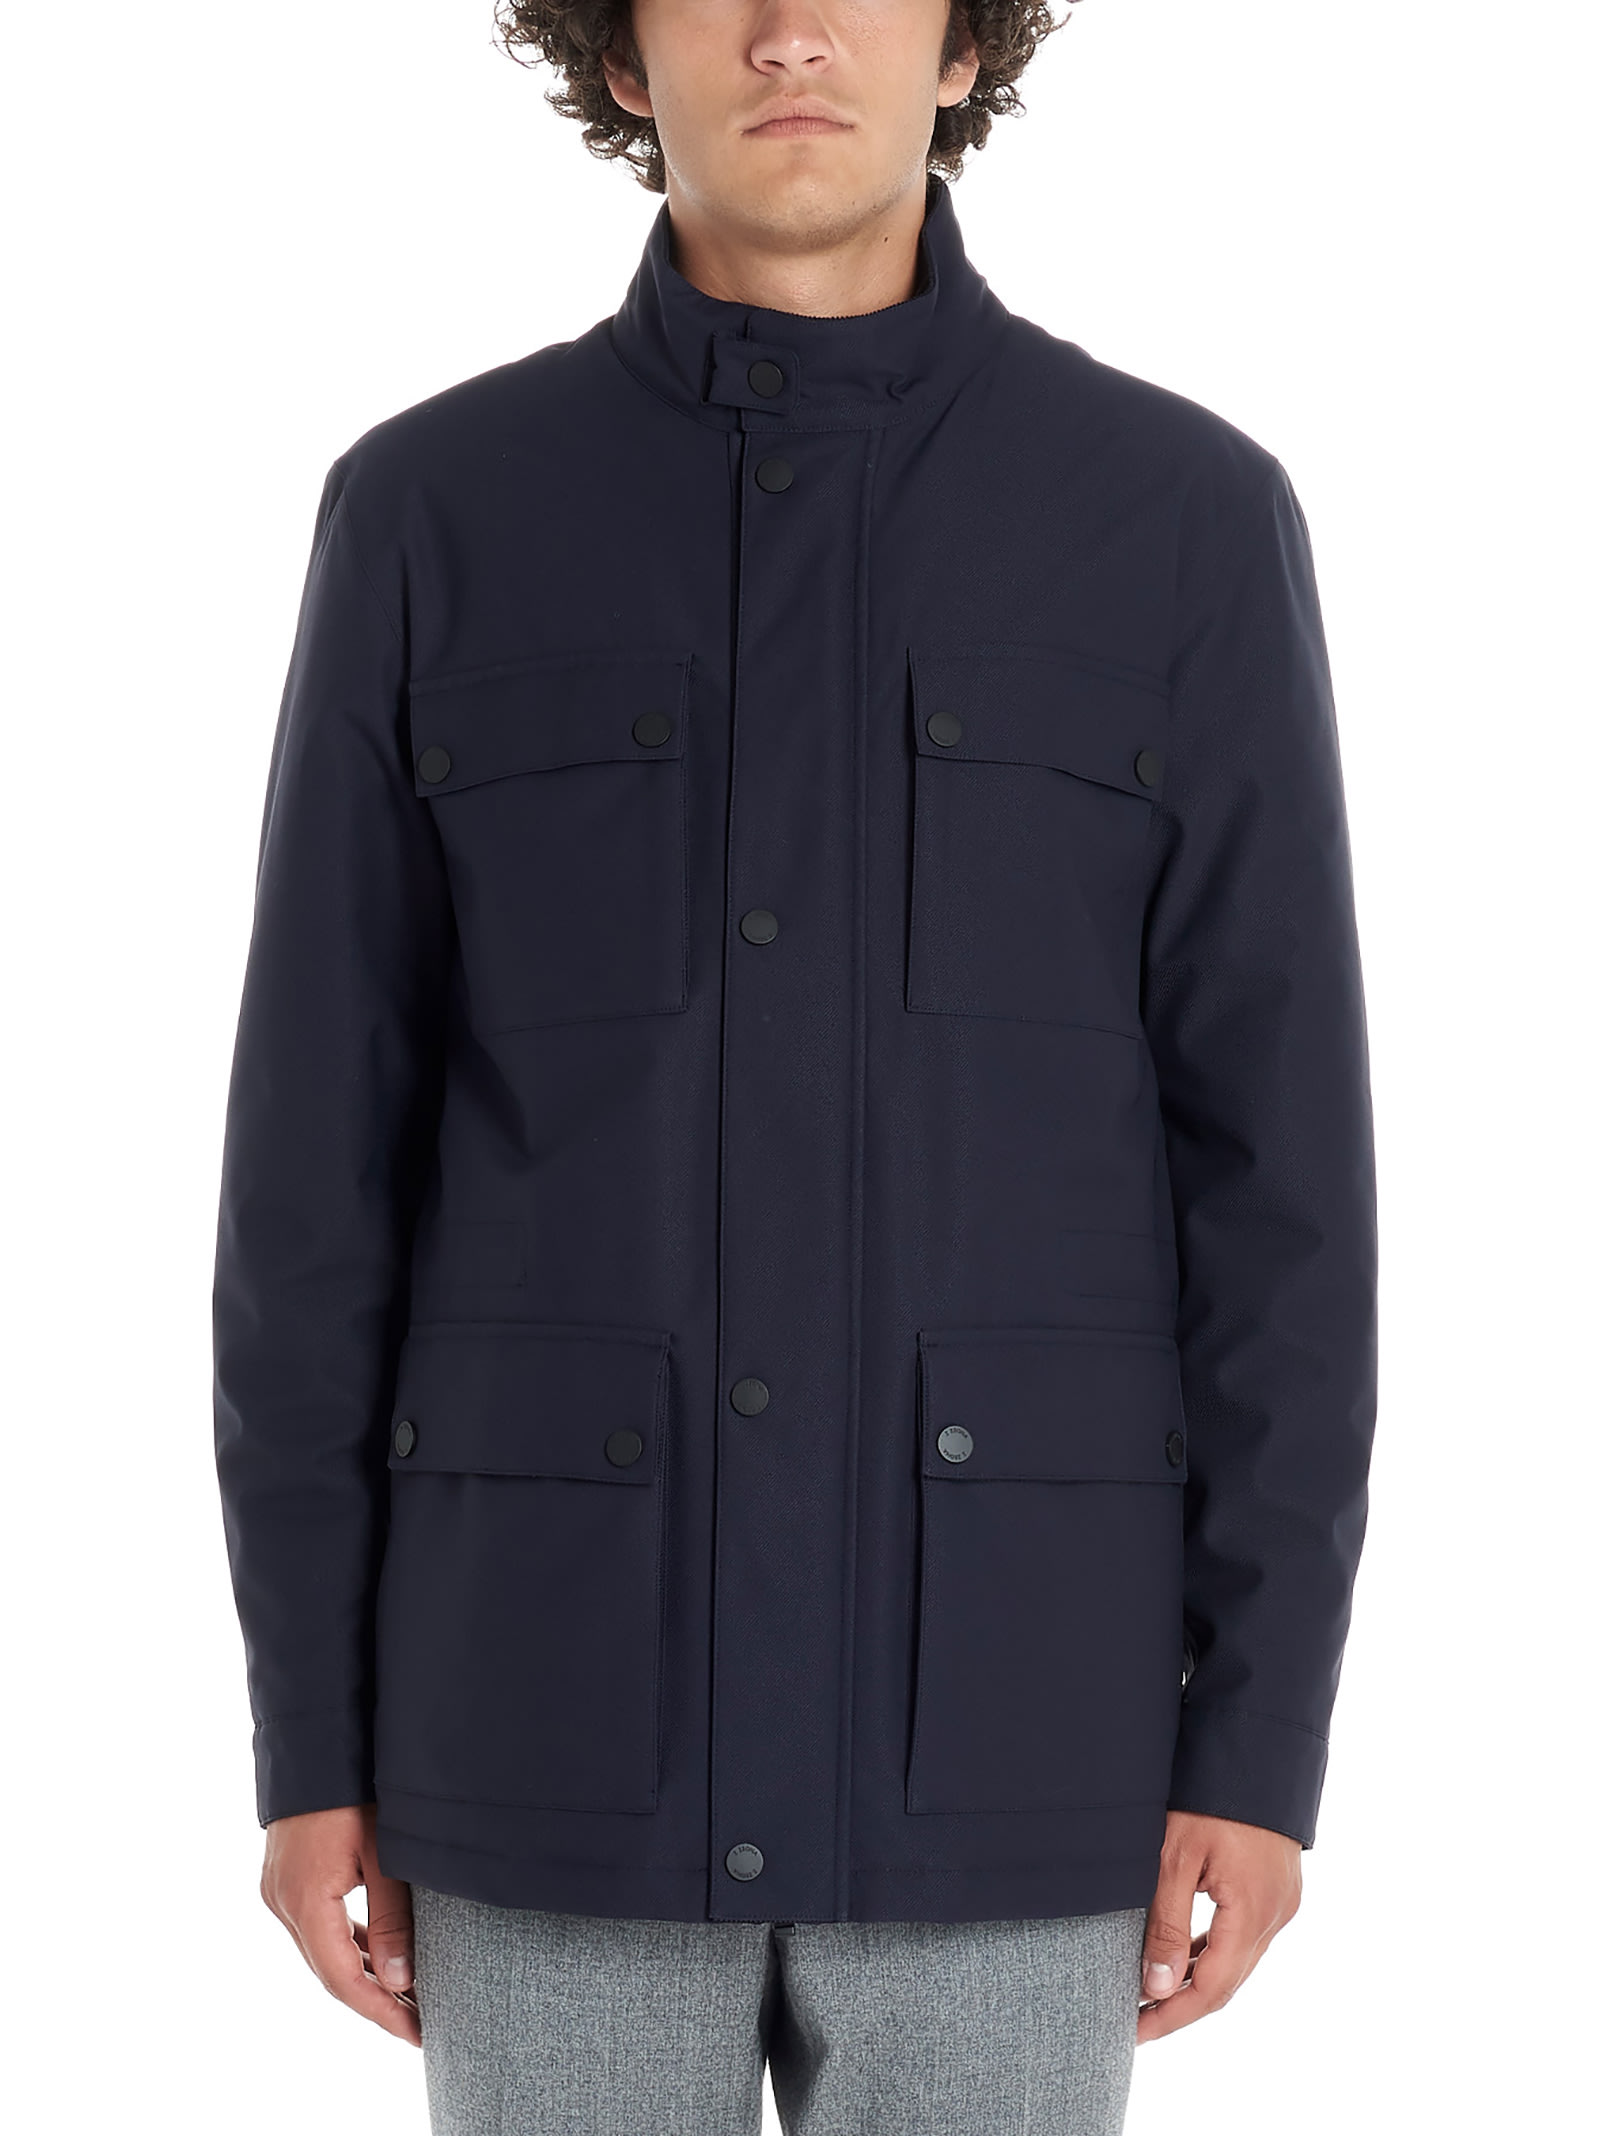 2b96300e Z Zegna 'field' Jacket